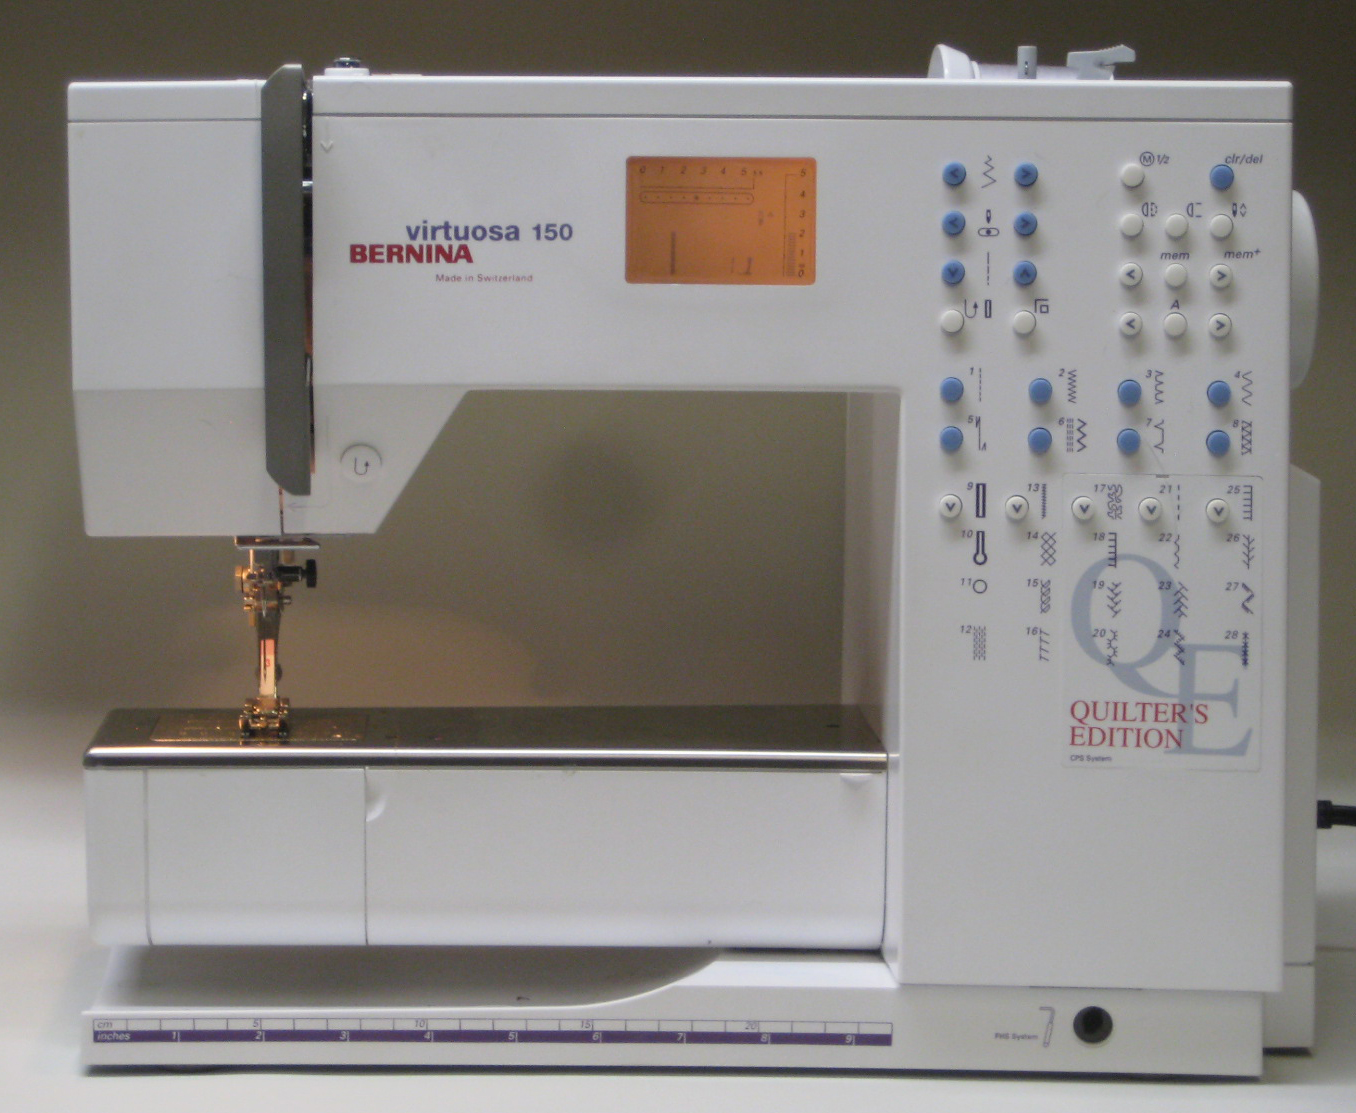 mi vintage sewing machines bernina virtuosa 150 qe rh mivintagesewingmachines blogspot com bernina virtuosa 150 manual bernina virtuosa 150 manual free download